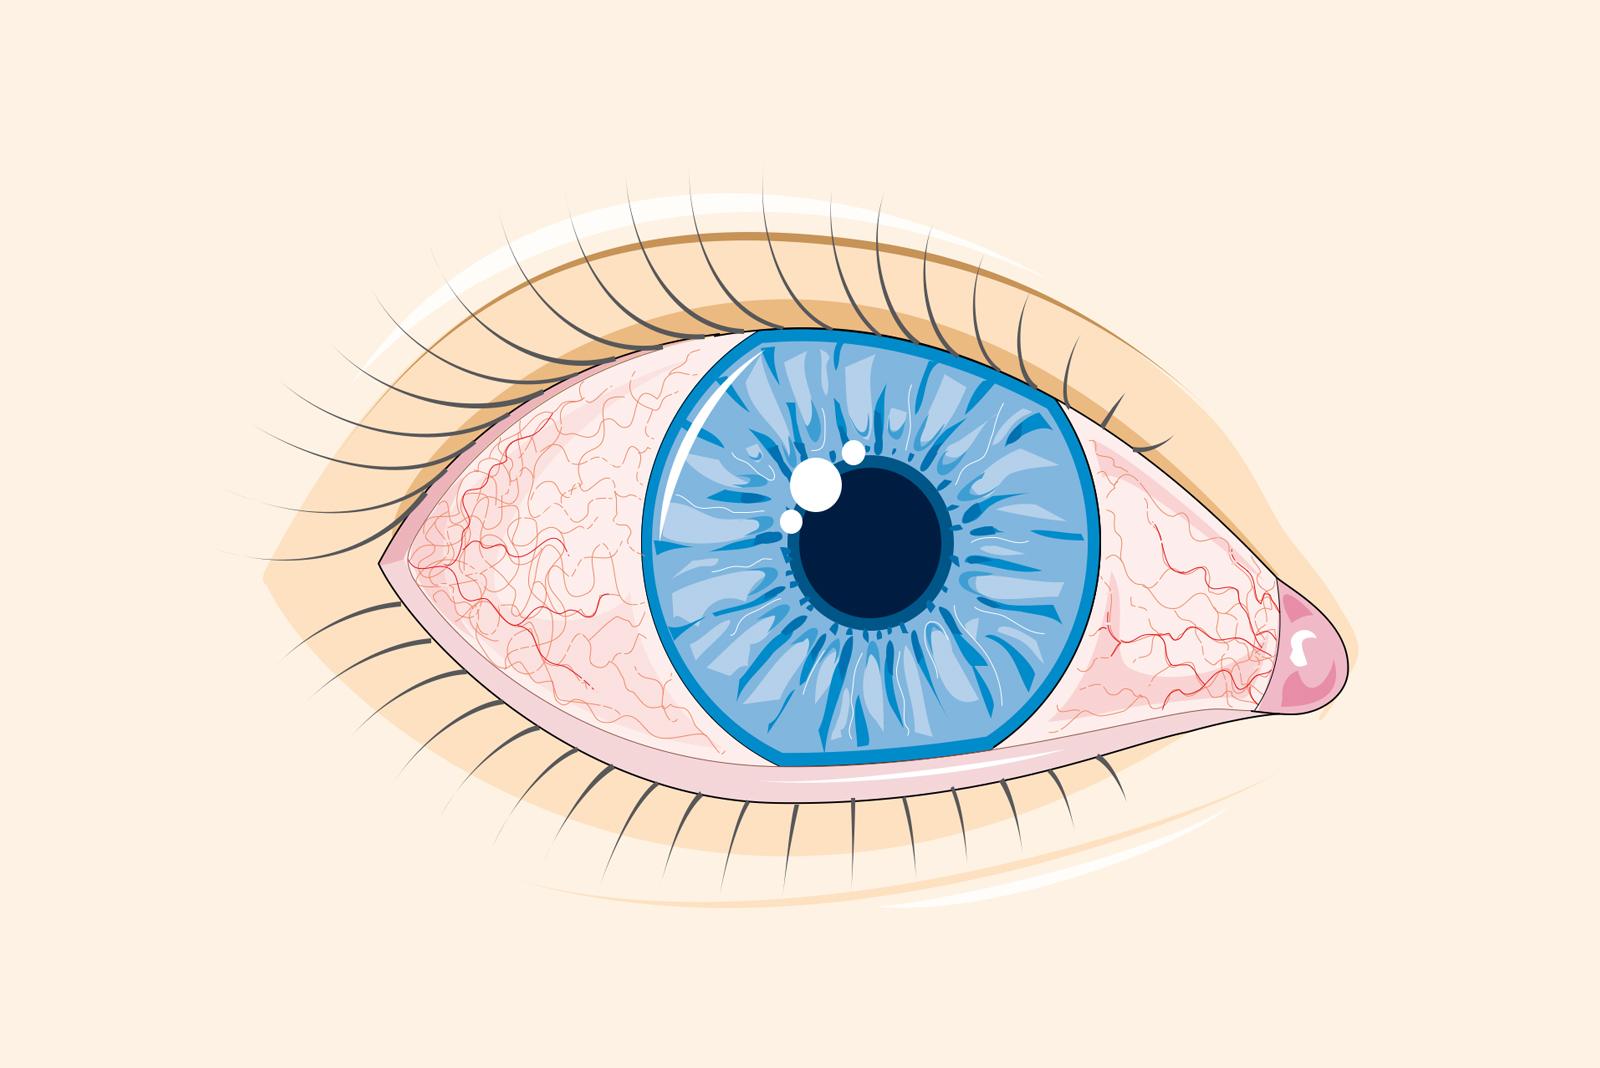 Ochi incetosat